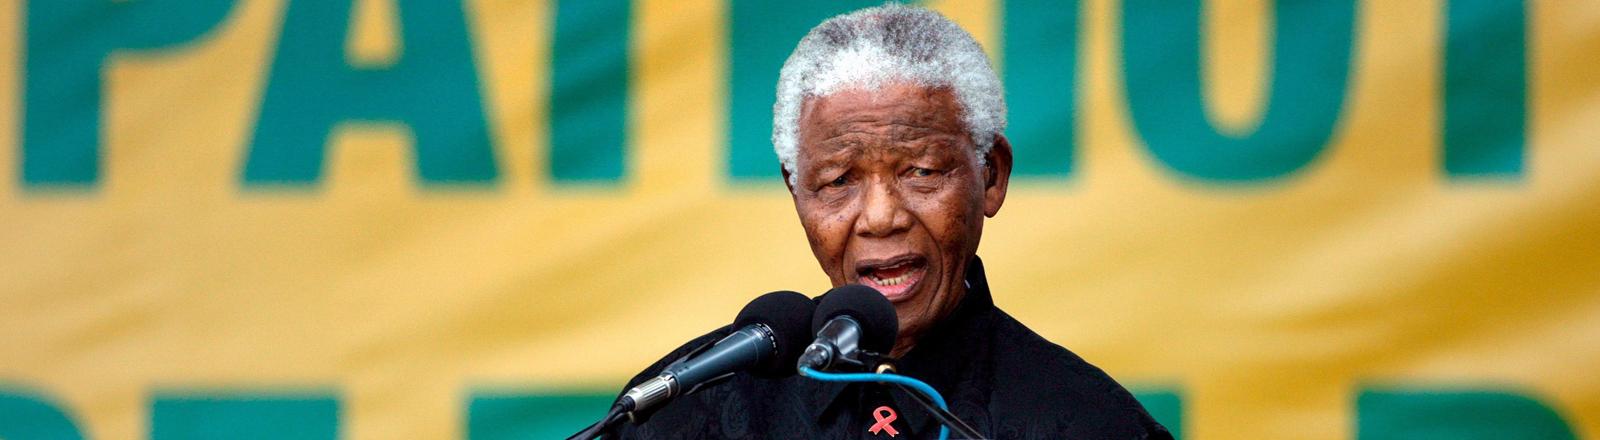 Mandela am Mikrofon